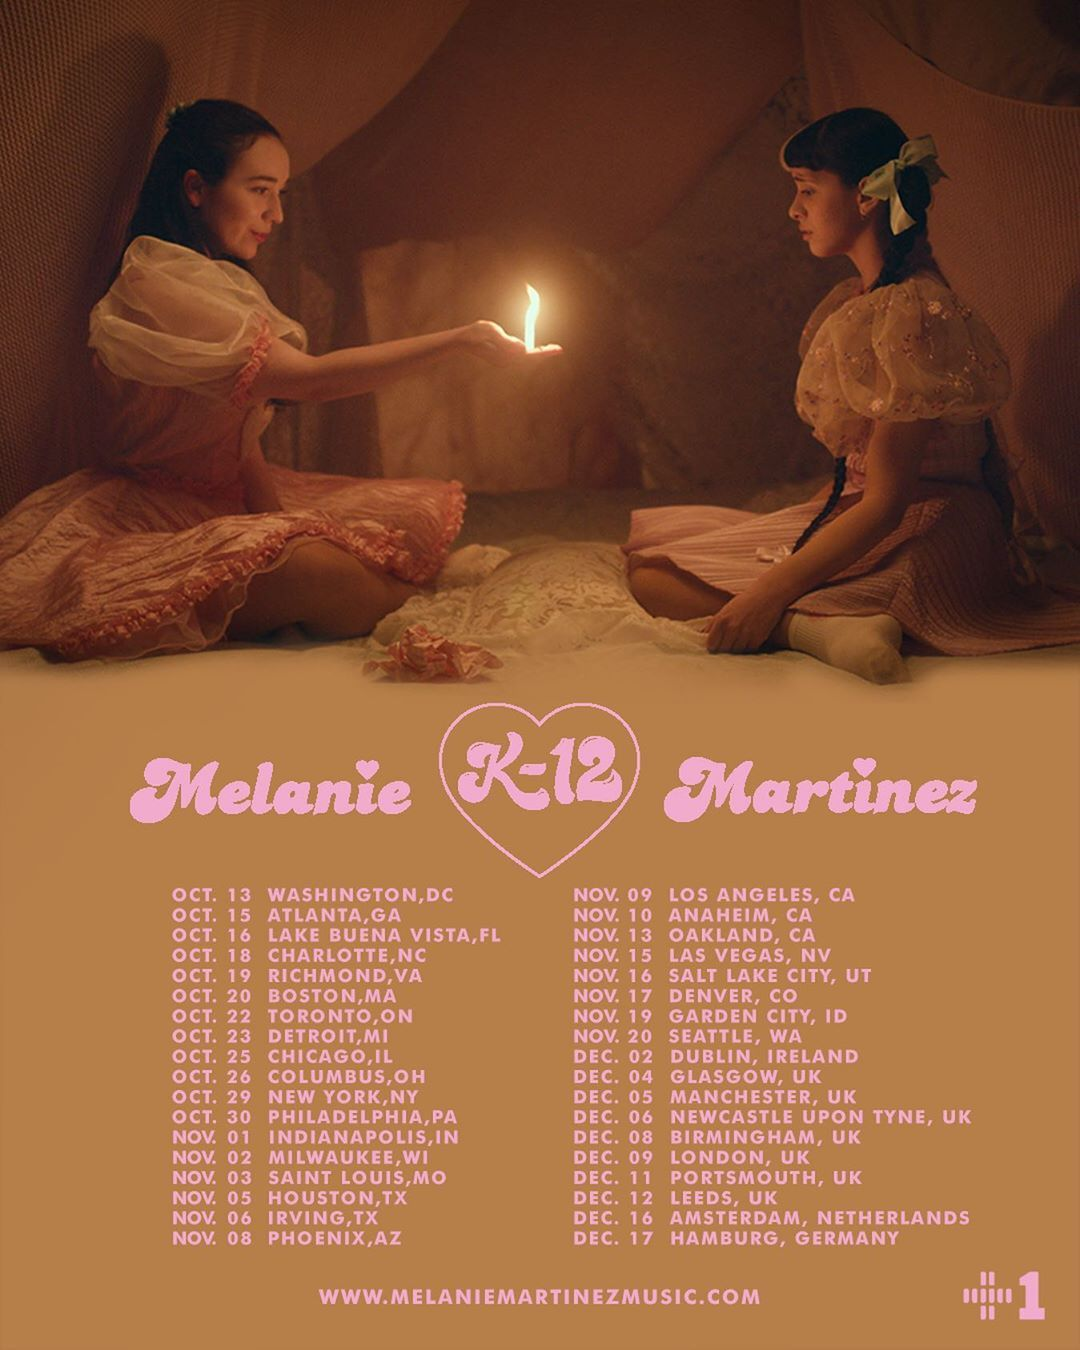 K 12 Tour Dates Angelita Emma Harvey Elita Harkov Yunglita Elita And Crybaby Melanie Martinez Are Real Melanie Martinez Melanie Crybaby Melanie Martinez